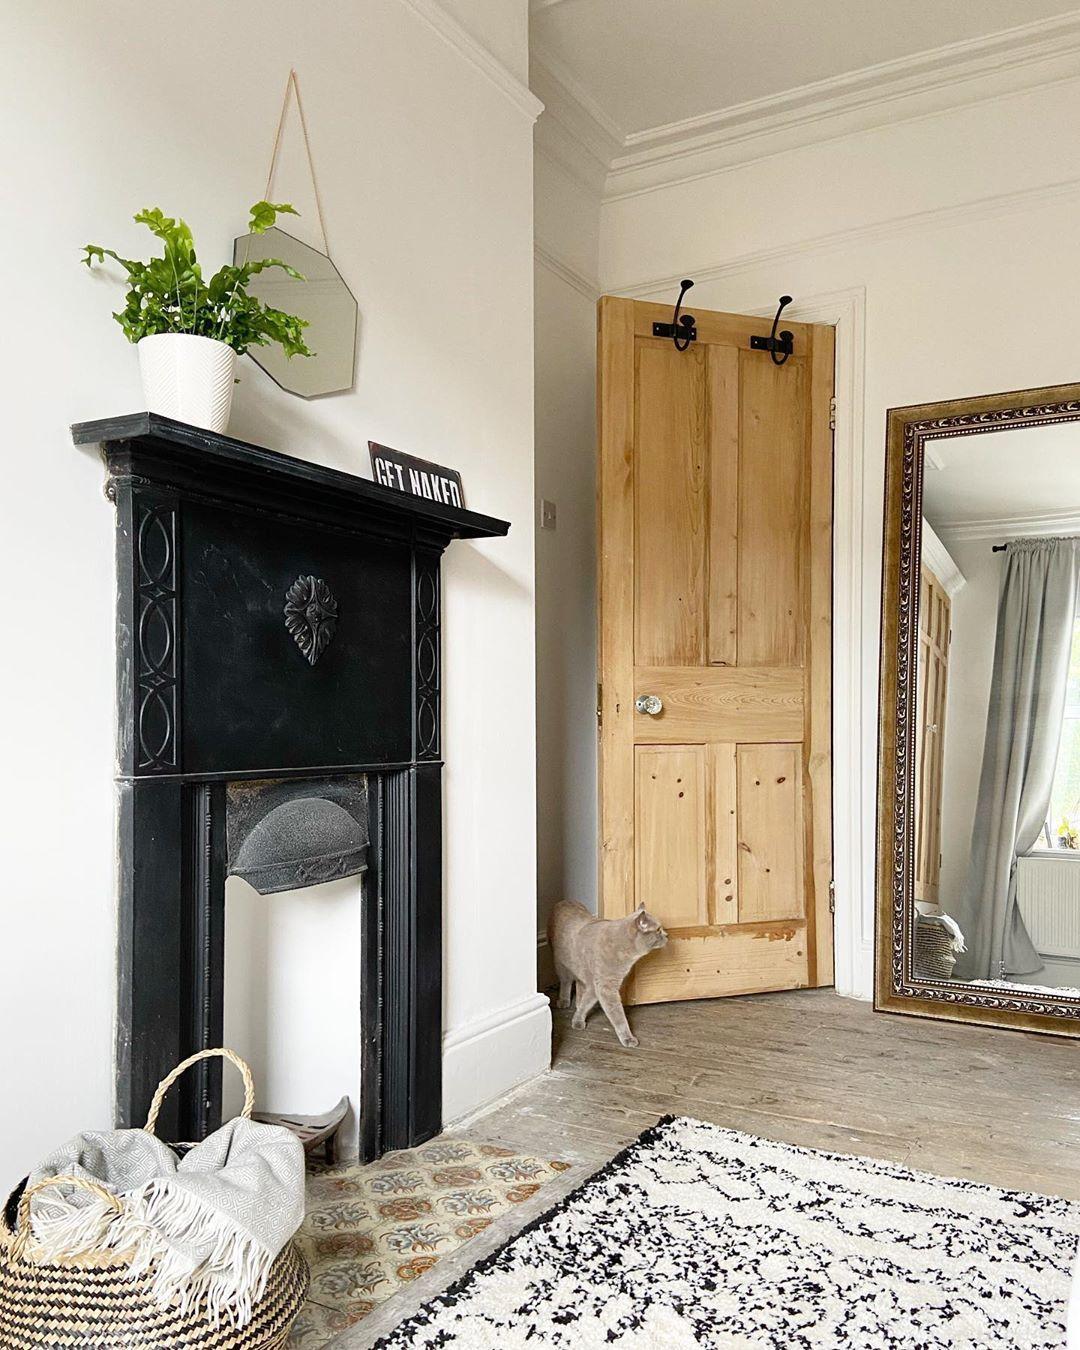 Featuring the cat... . . . . . . . . .  #bedroom #bedroomideas #bedroomdecor #originalfire #laredoute #rug #woodfloor #panelling #ikea #bedroominspo #lockdown #blackandwhite #homedesign #bedtime #oldhouse #wood #sheffield #bedroomdesign #bedroomgoals #diy #deco #inspo #homeinspo #lockdownrenovation #mirror #originaldoors #coving